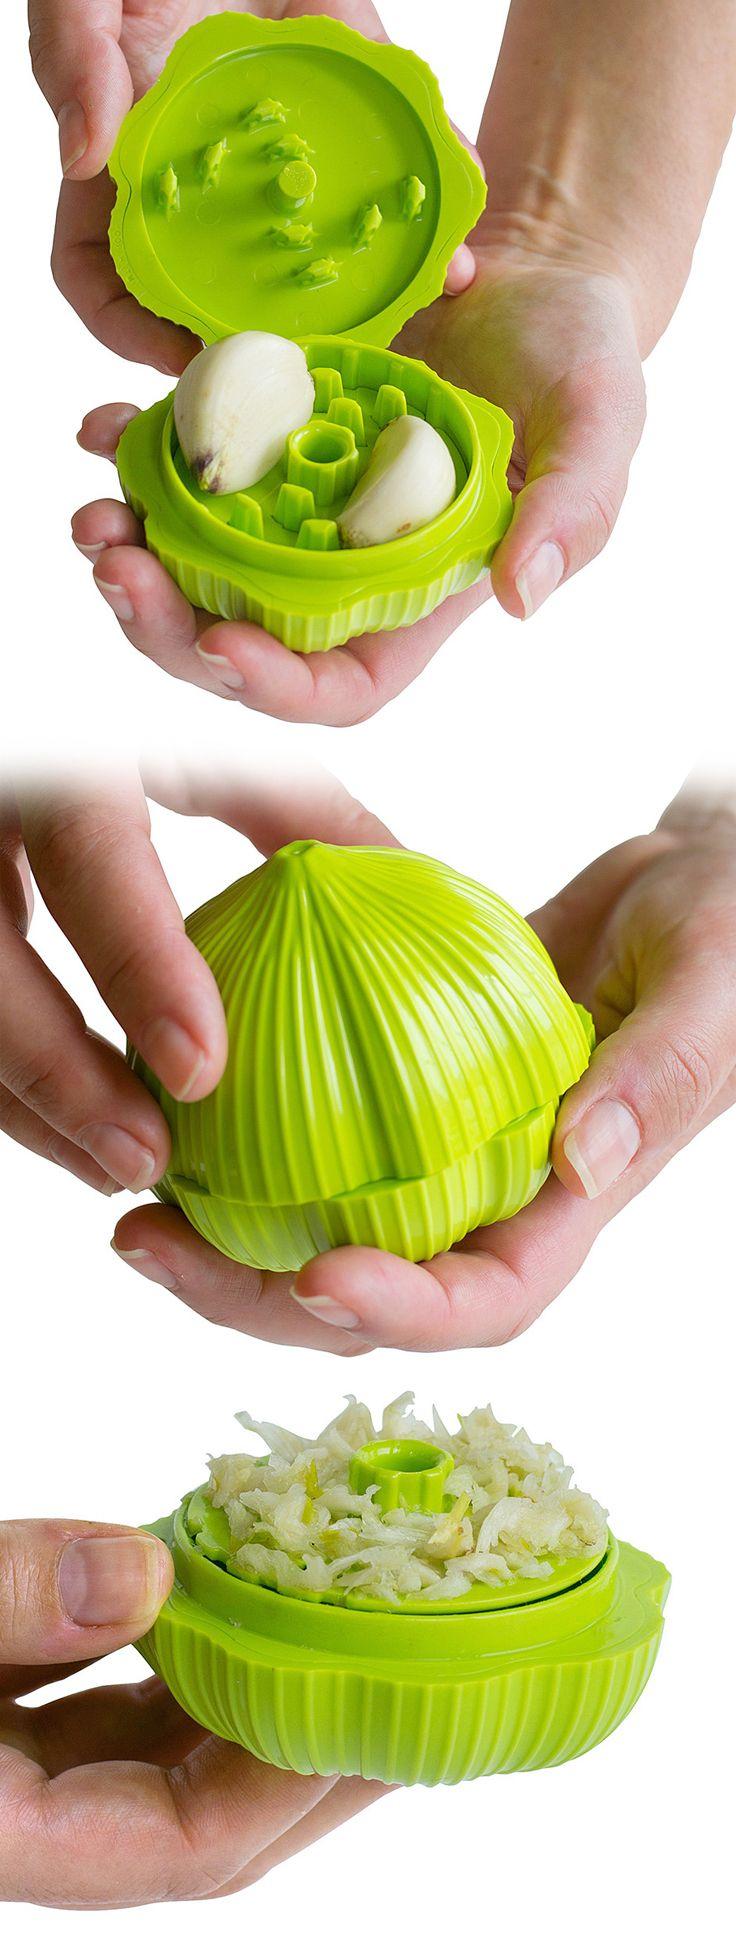 Garlic Chopper - insert, twist and chop! Awesome kitchen gadget! #product_design